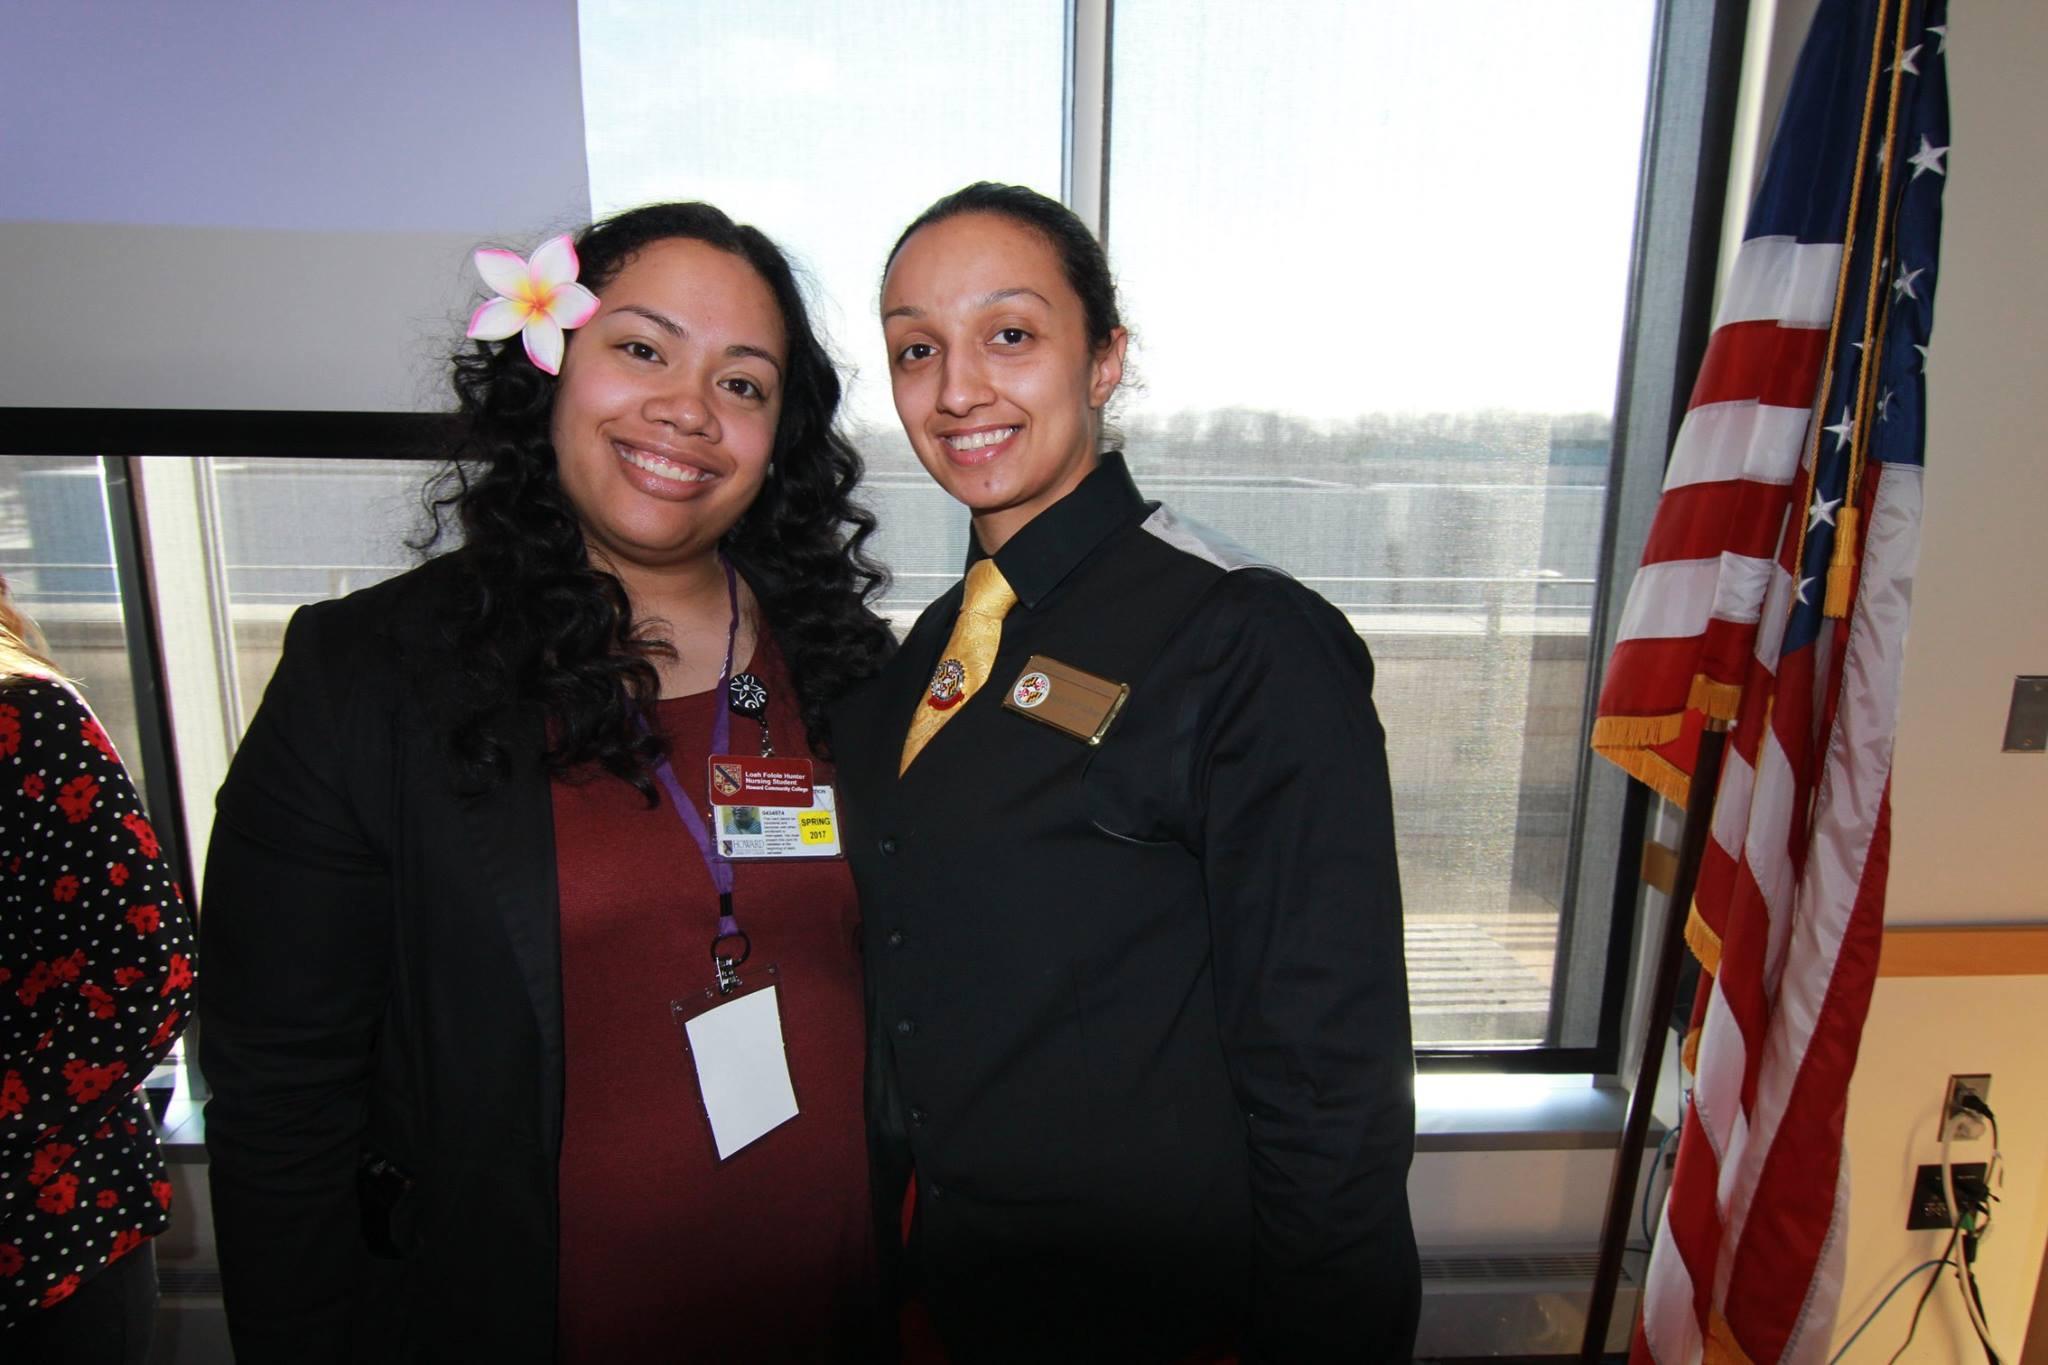 Maryland Association of Nursing Students - Board of Directors